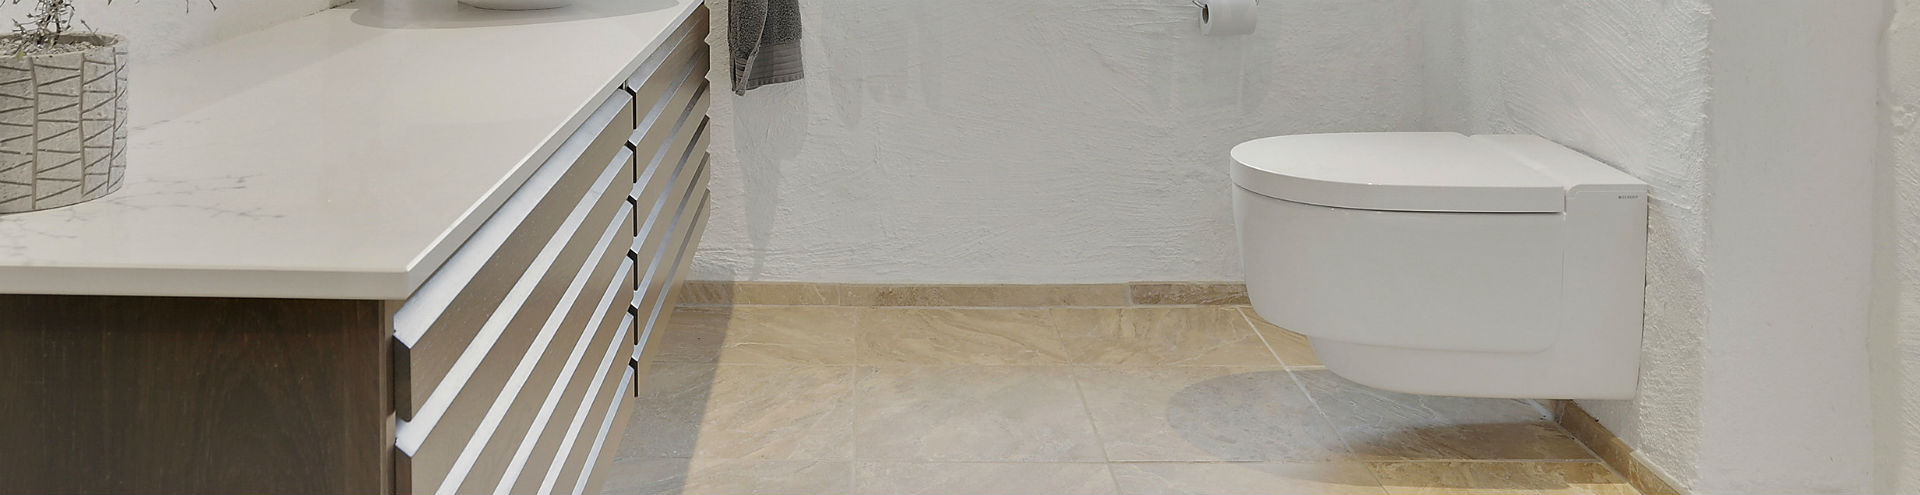 Top Nyt toilet? Få viden, priser og gode råd her WK84